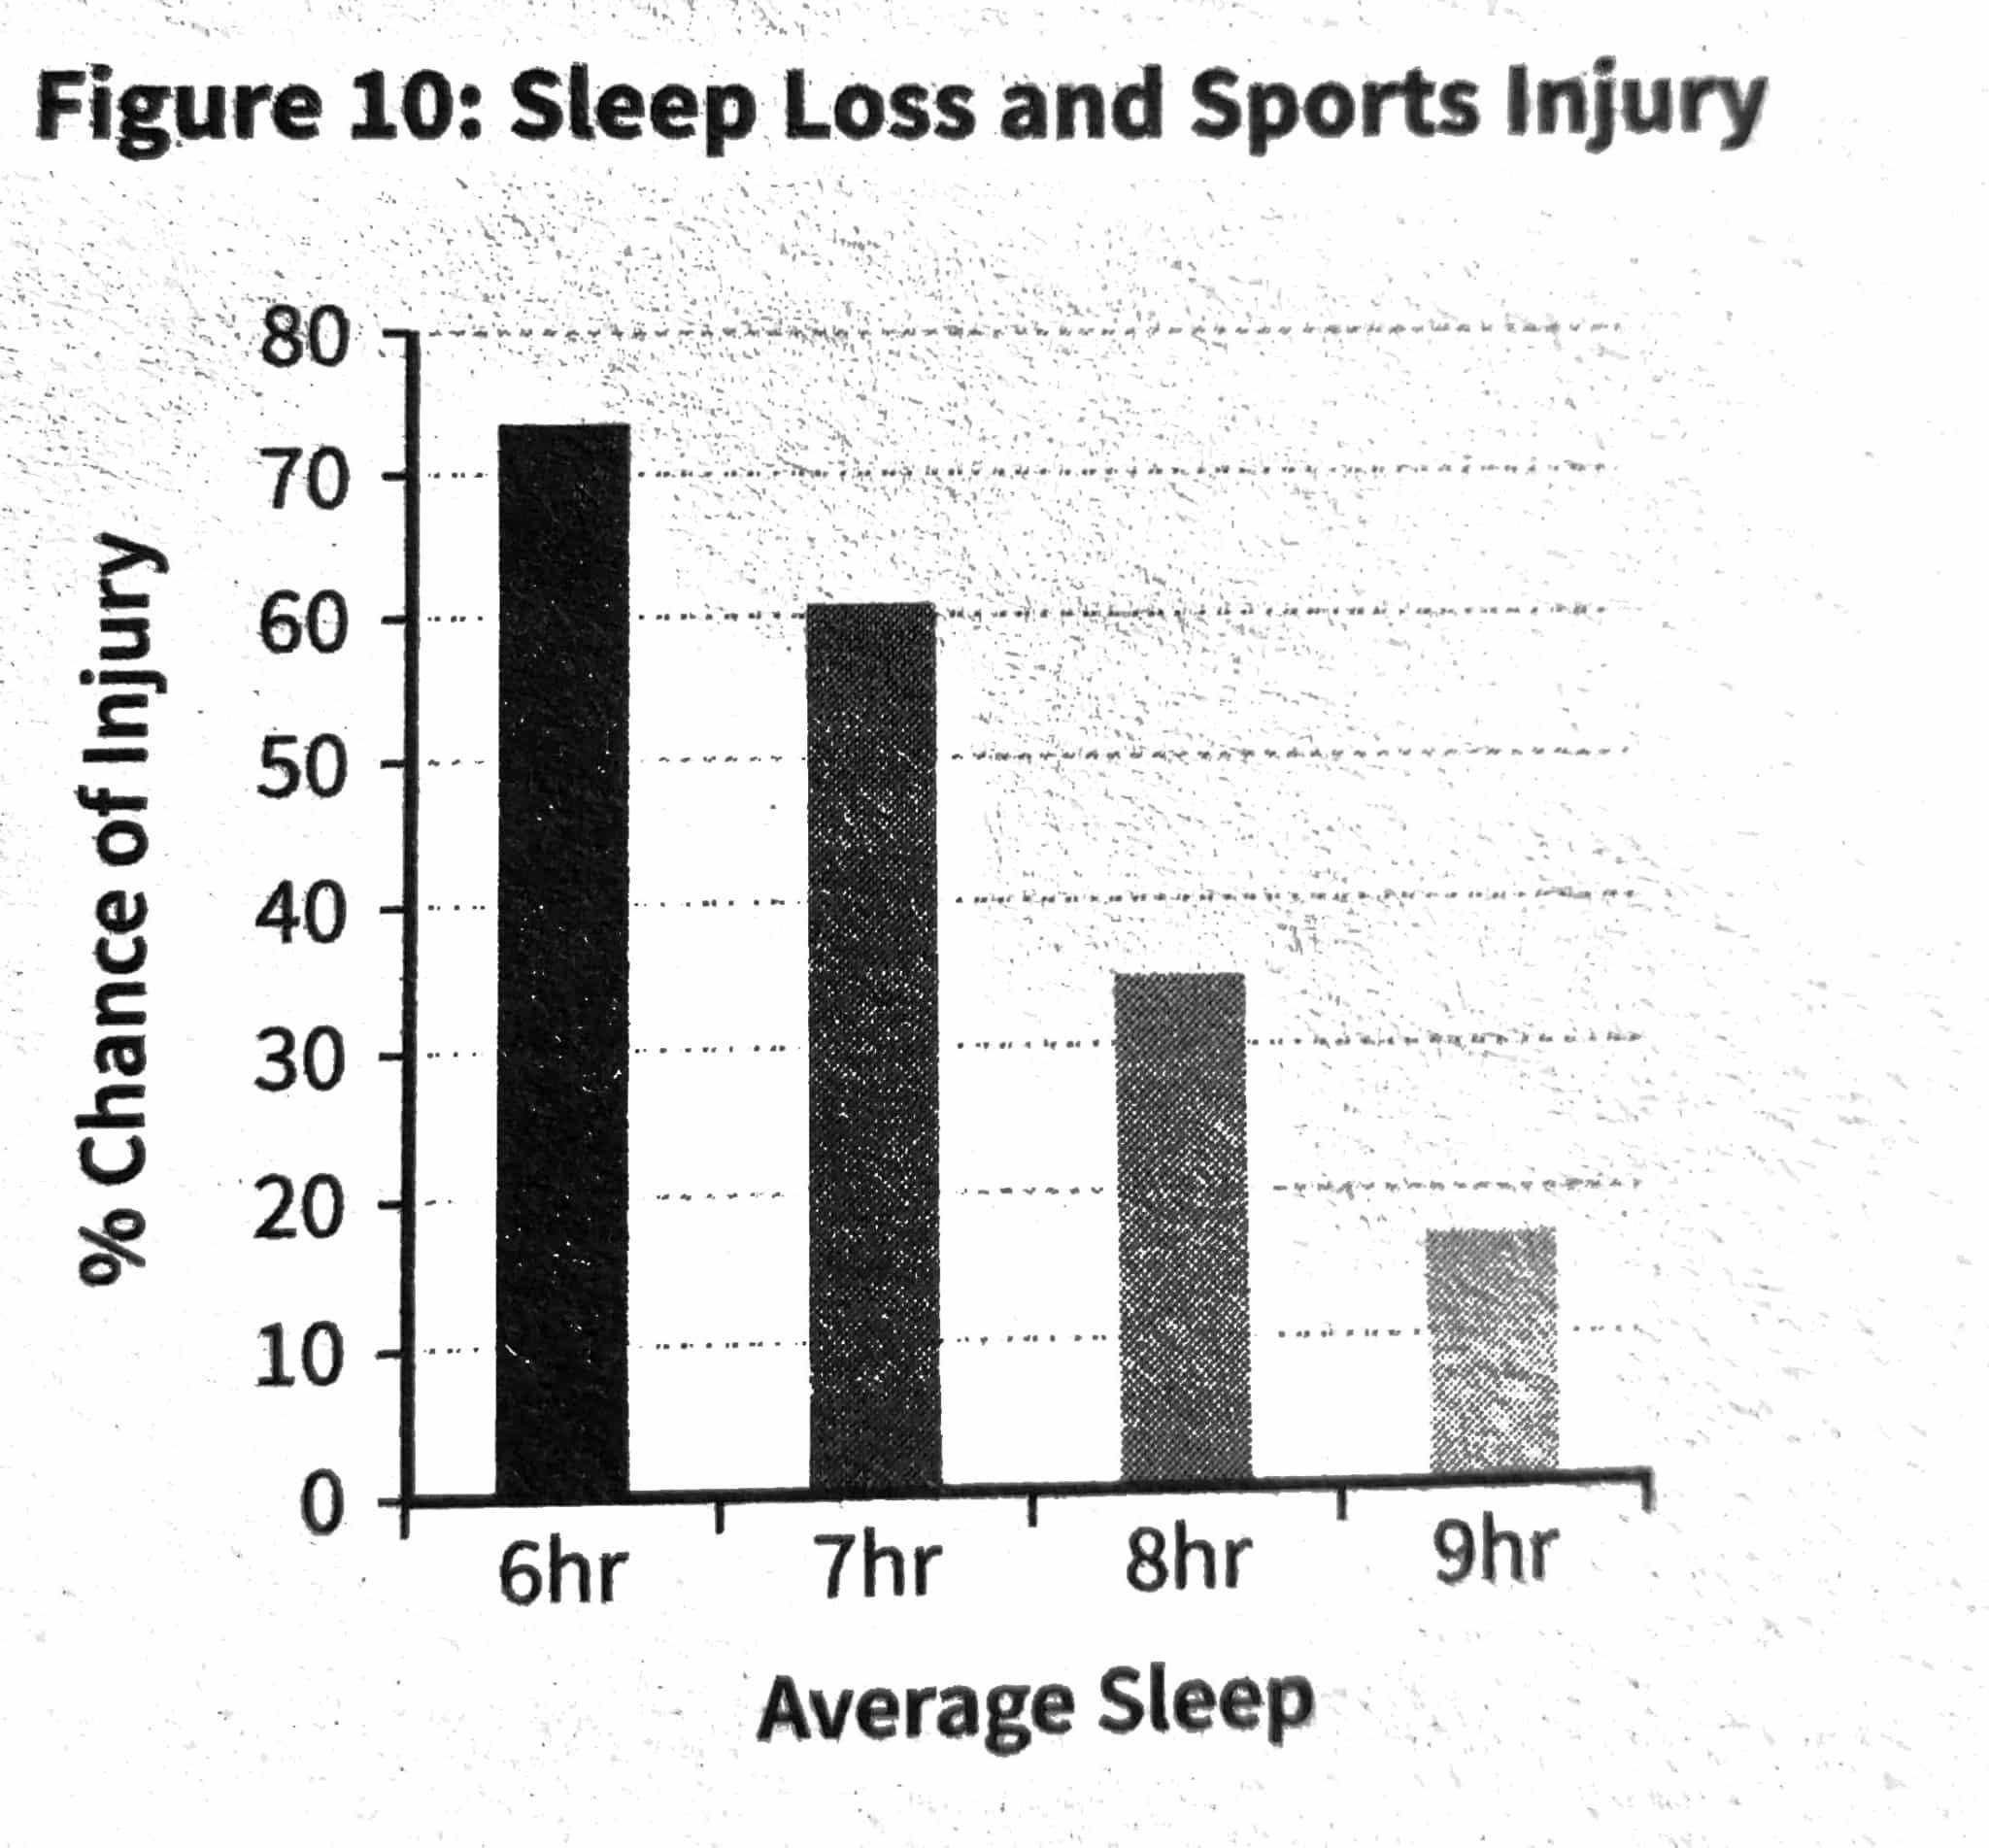 sommeil et blessure sportive